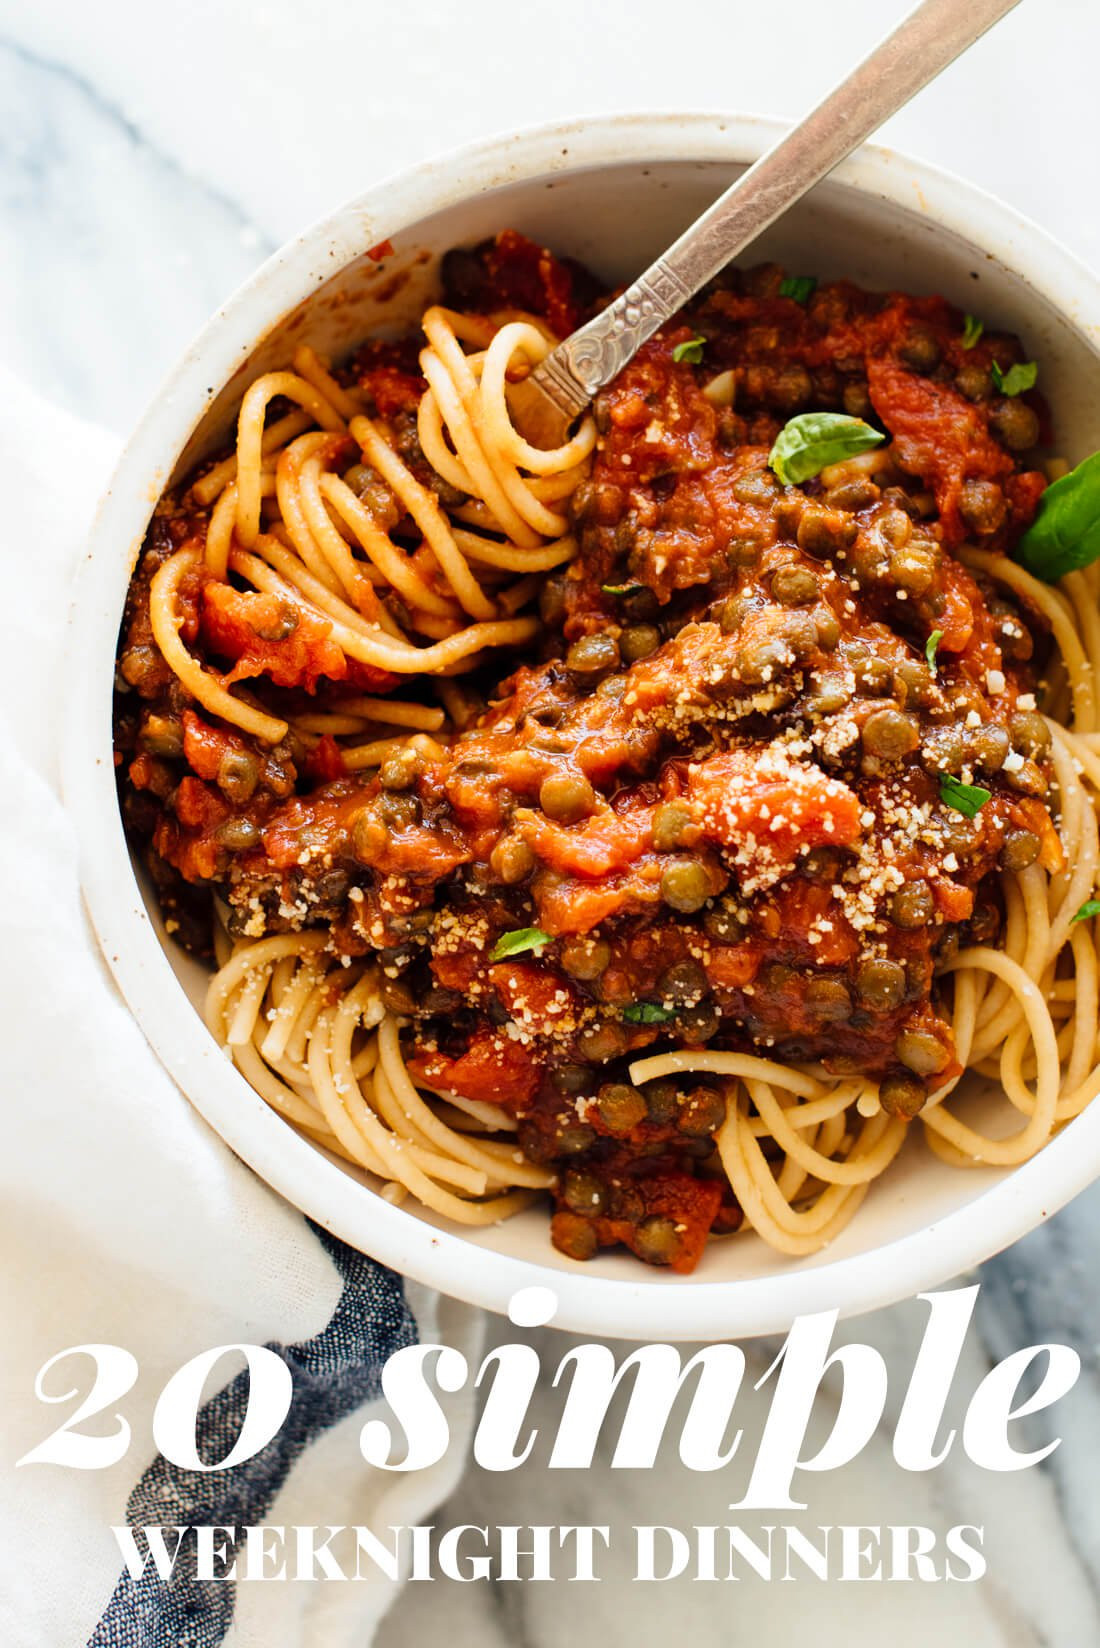 Best Vegan Dinner Recipes  20 Simple Ve arian Dinner Recipes Cookie and Kate